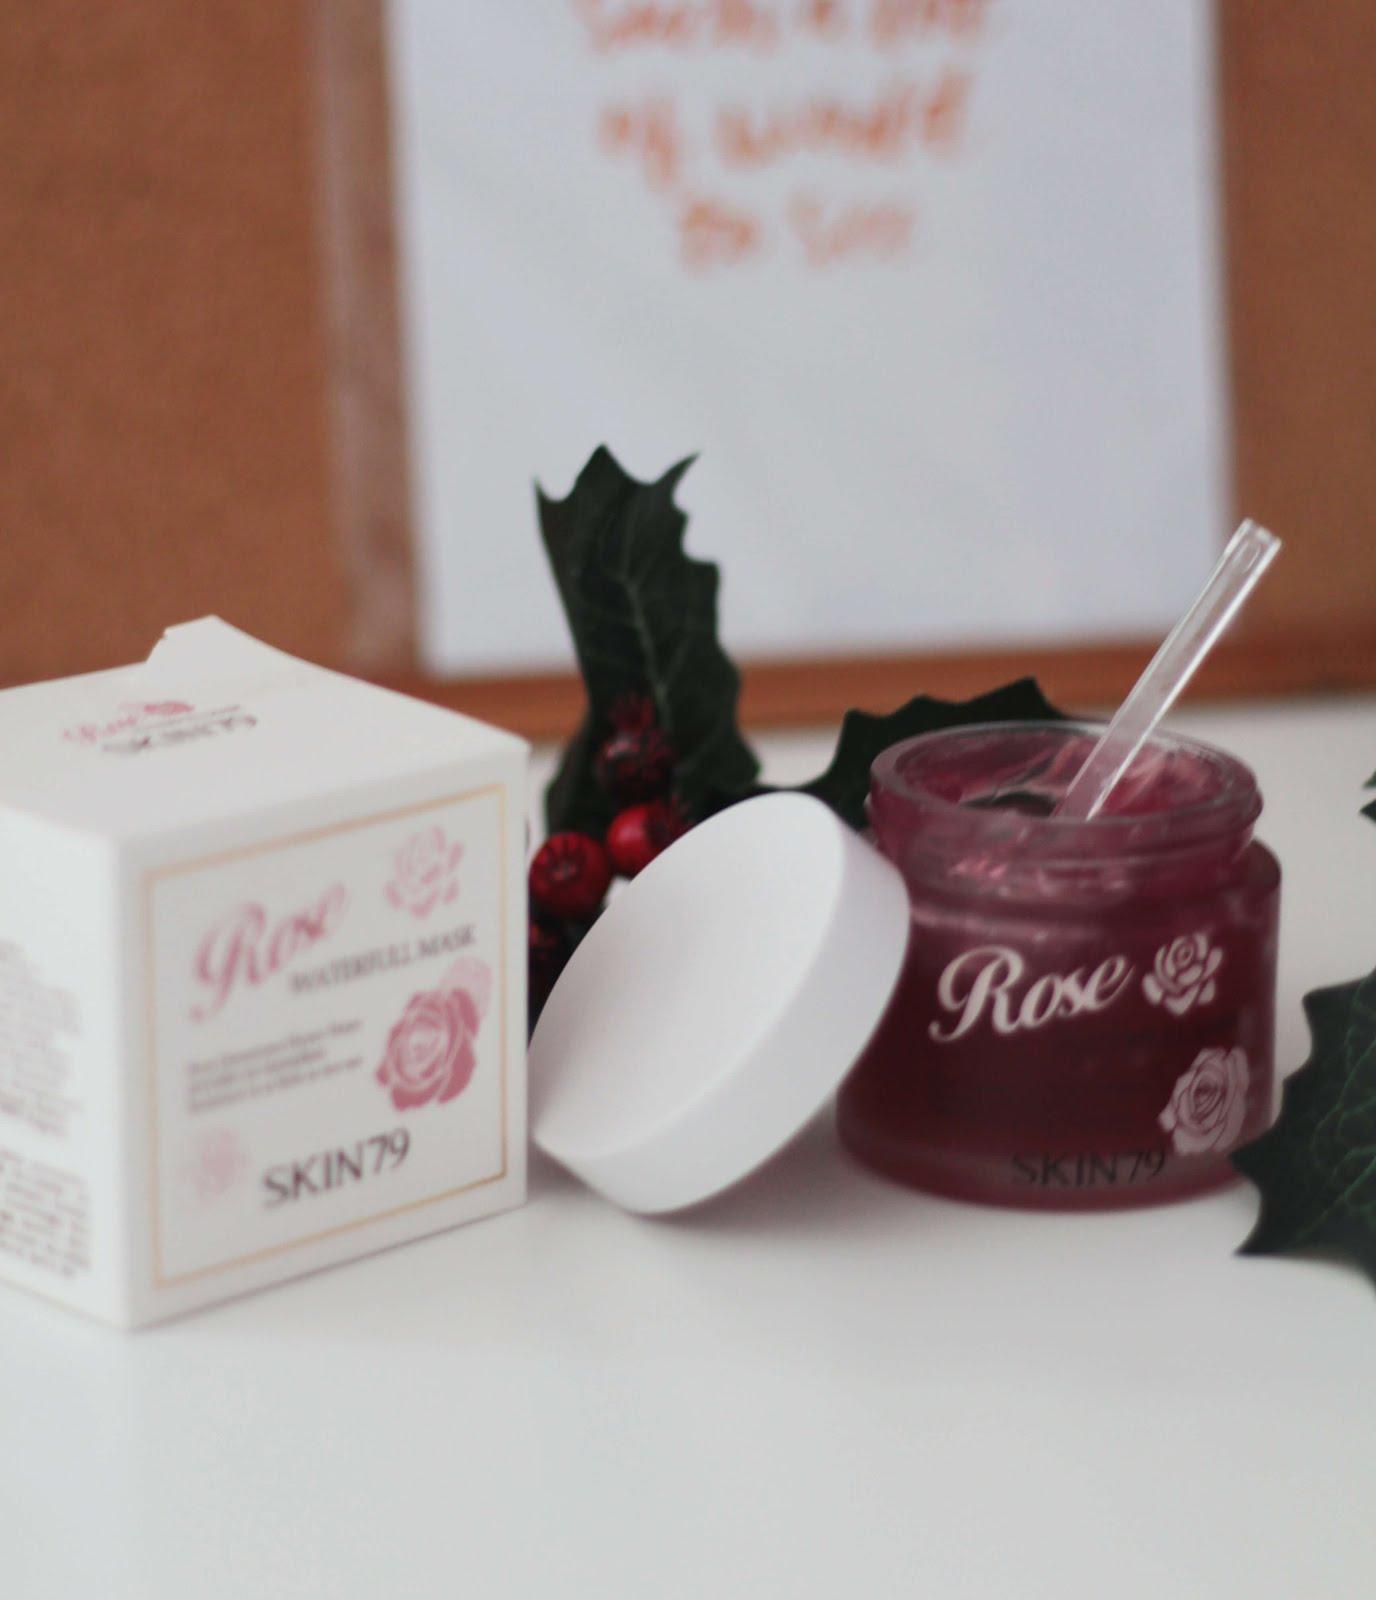 skin79 rose waterfull mask review